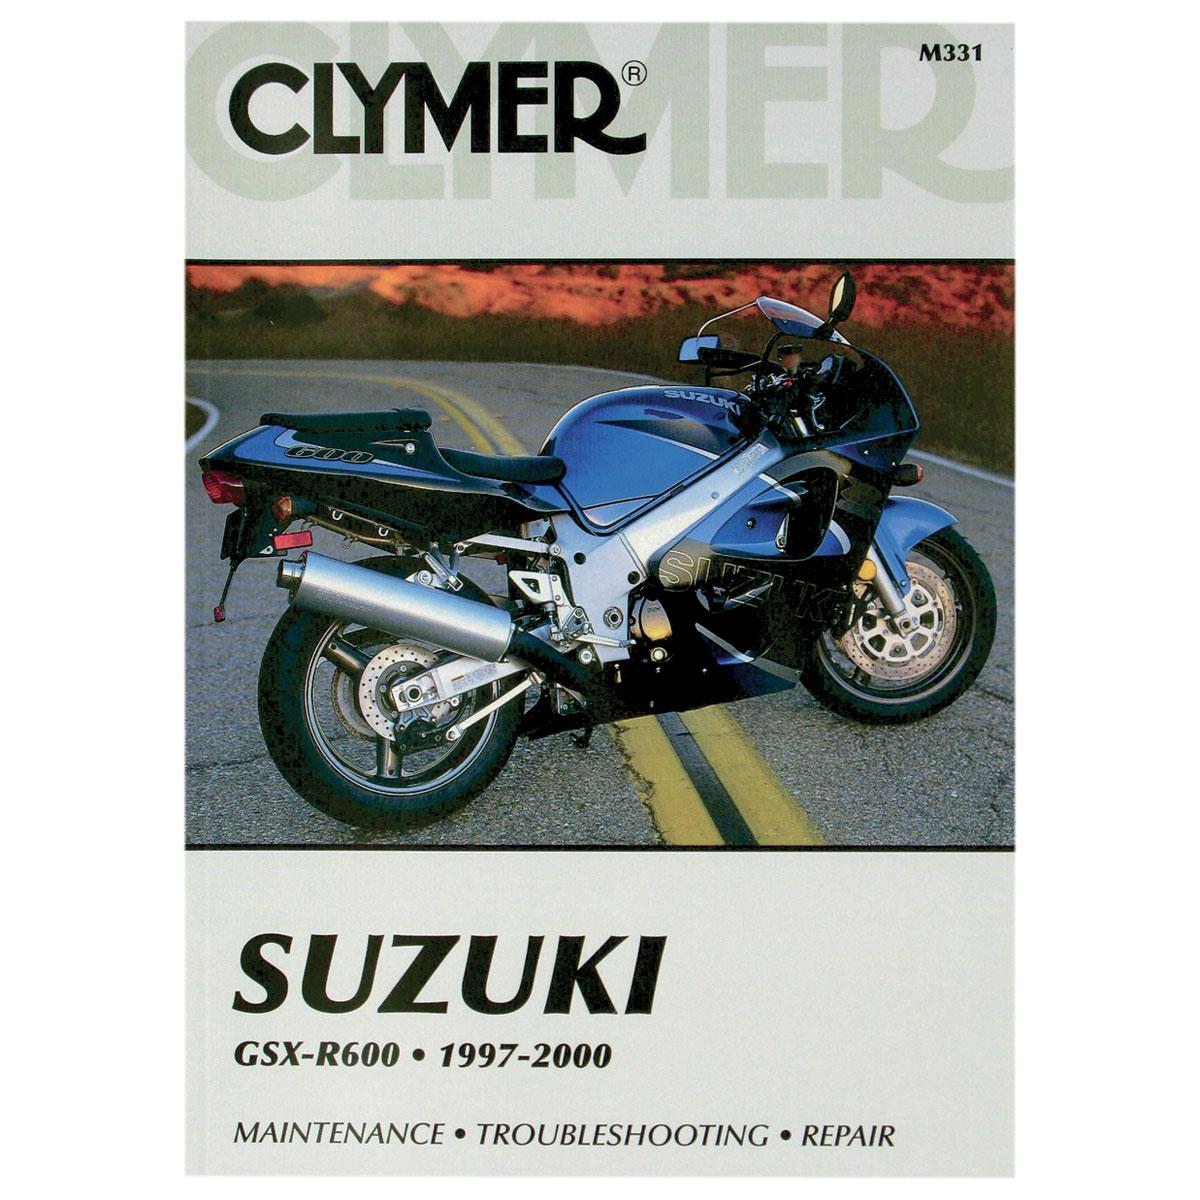 Clymer Suzuki Motorcycle Repair Manual